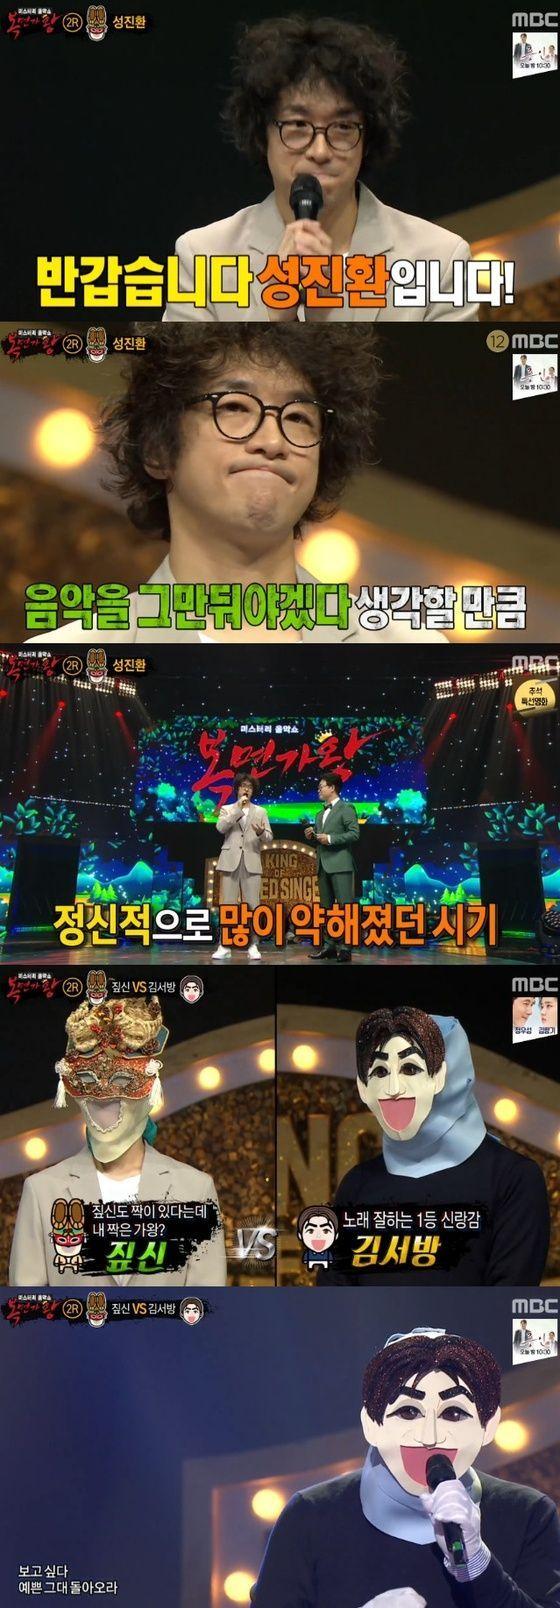 MBC '복면가왕' 가수 성진환 / 사진=MBC 방송 캡처